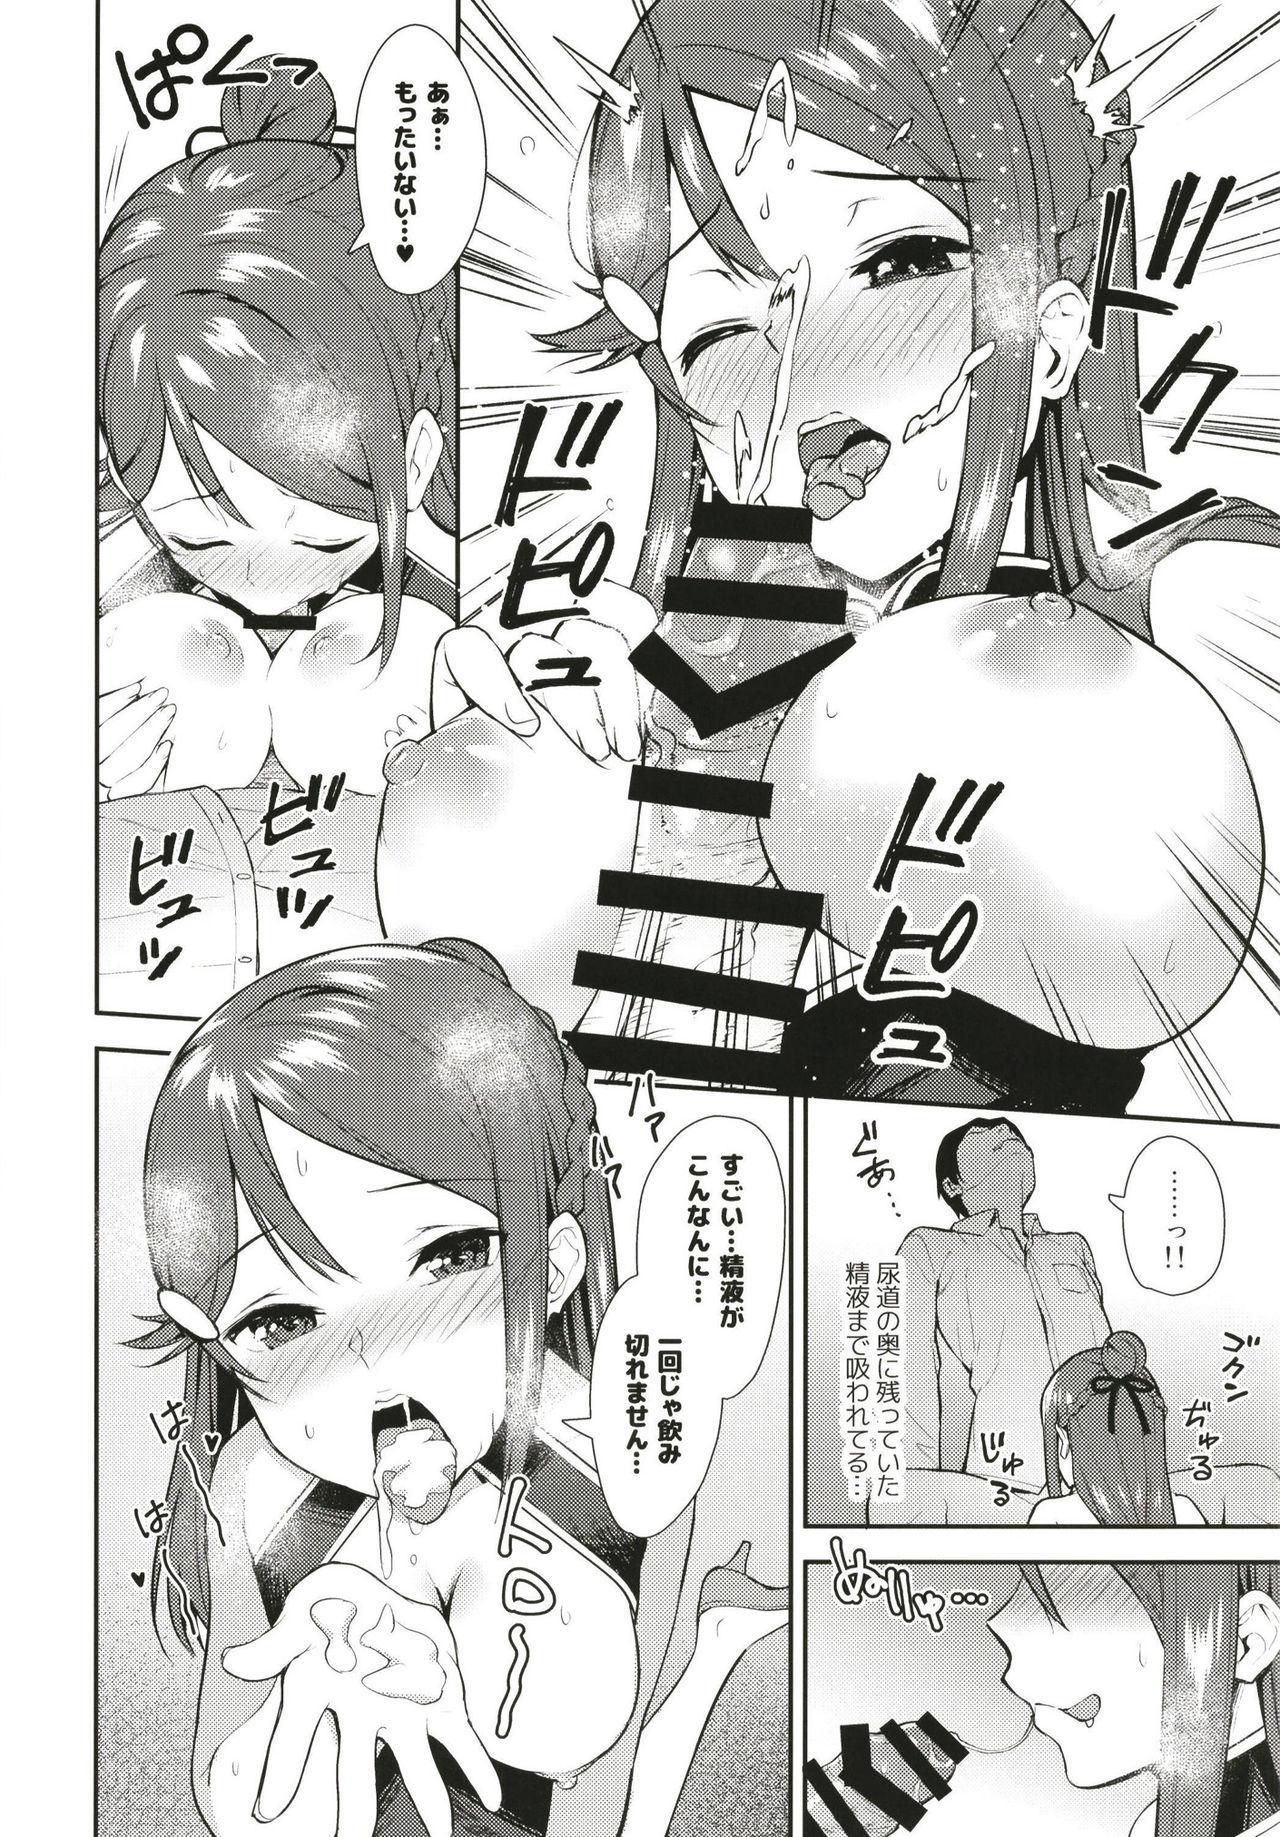 Kyou kara Hajimaru Sex Life Fortissimo - Start in my brand new SEX life. 15